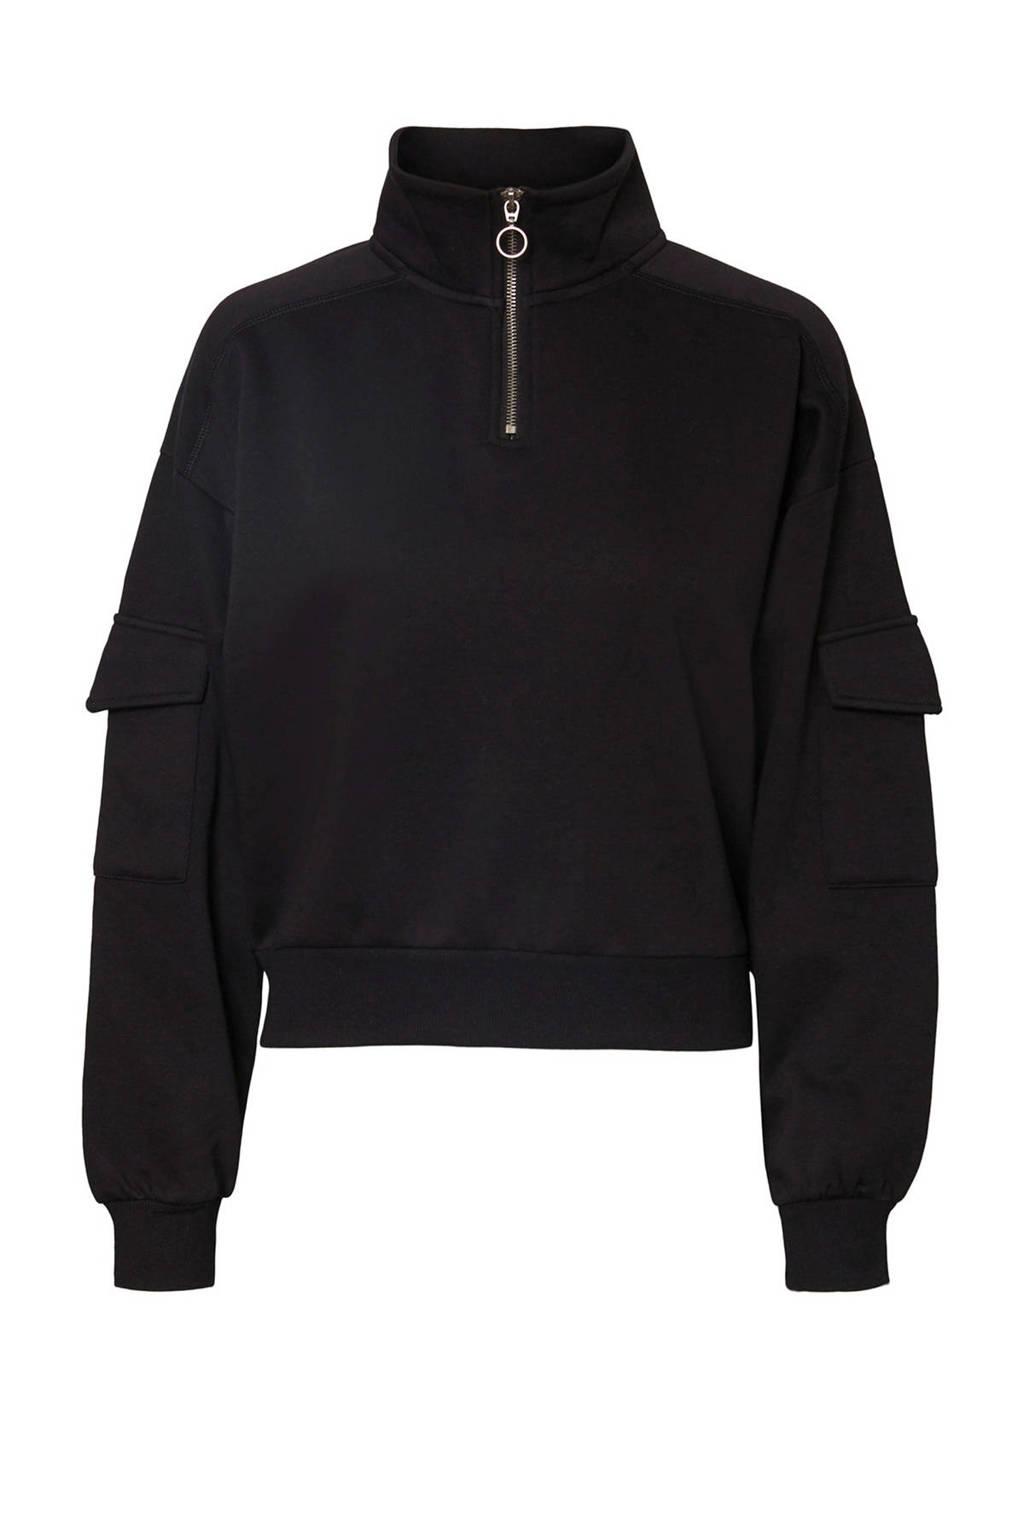 NOISY MAY trui zwart, Zwart